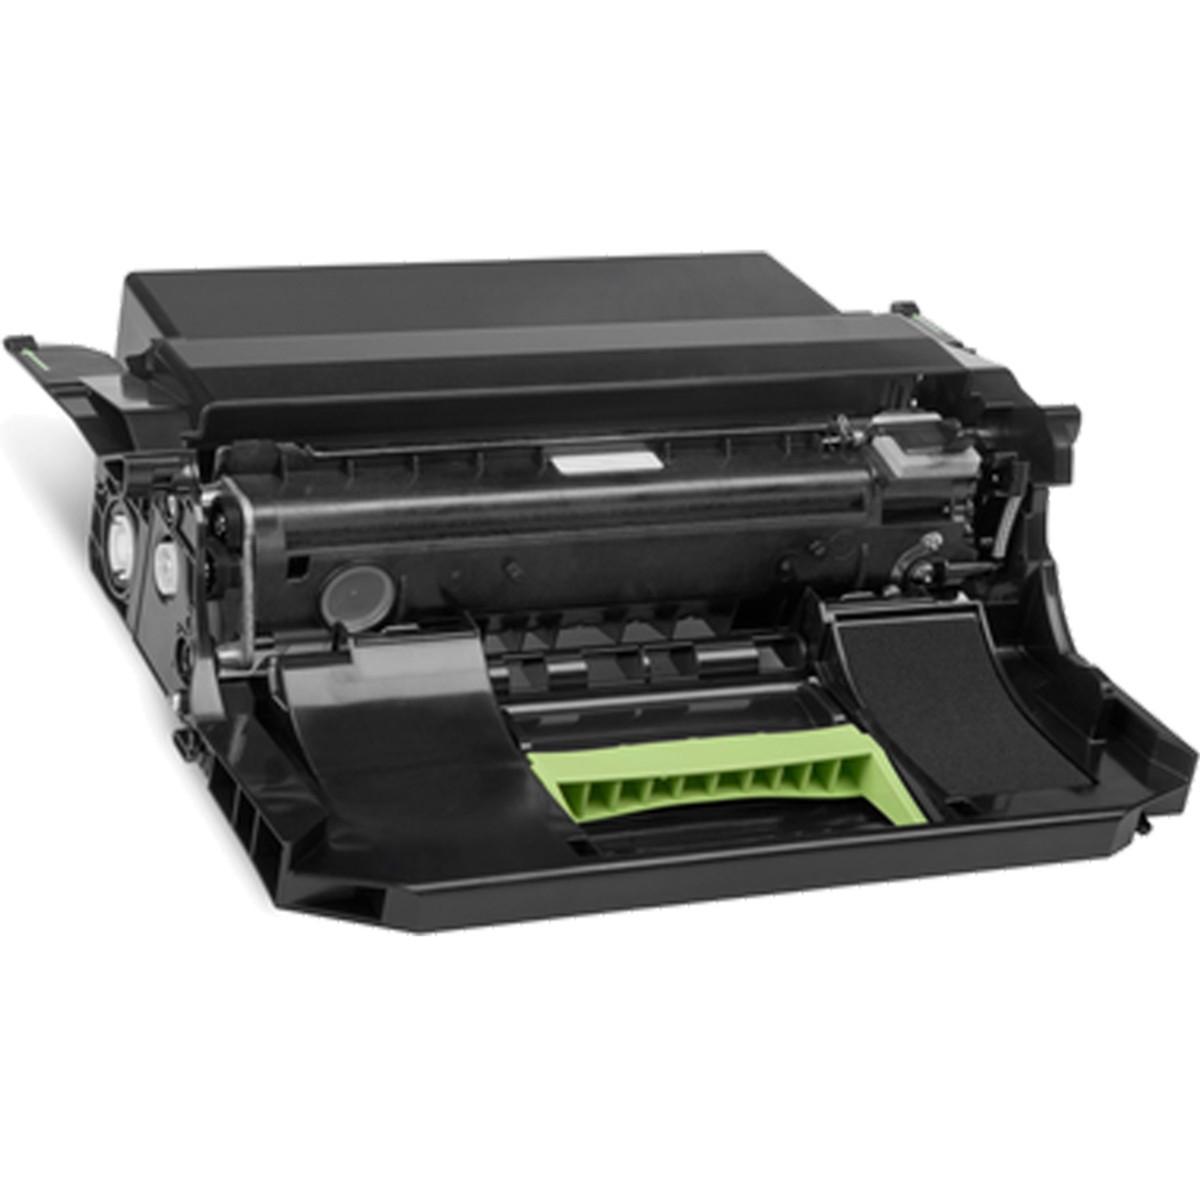 Fotocondutor nacional para Lexmark 52D0Z00 52D MX812 MX811 MX810 MX710 MX711 MS812 MS810 MS811 100k